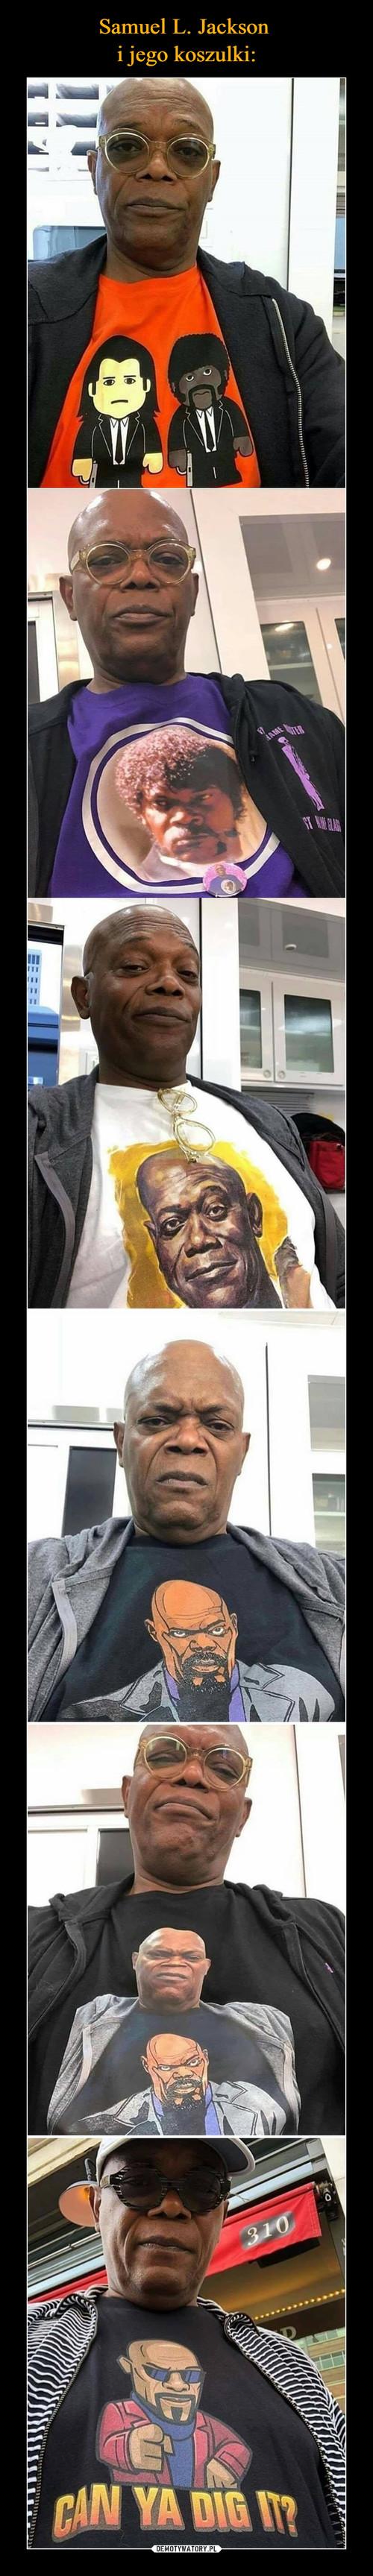 Samuel L. Jackson  i jego koszulki: